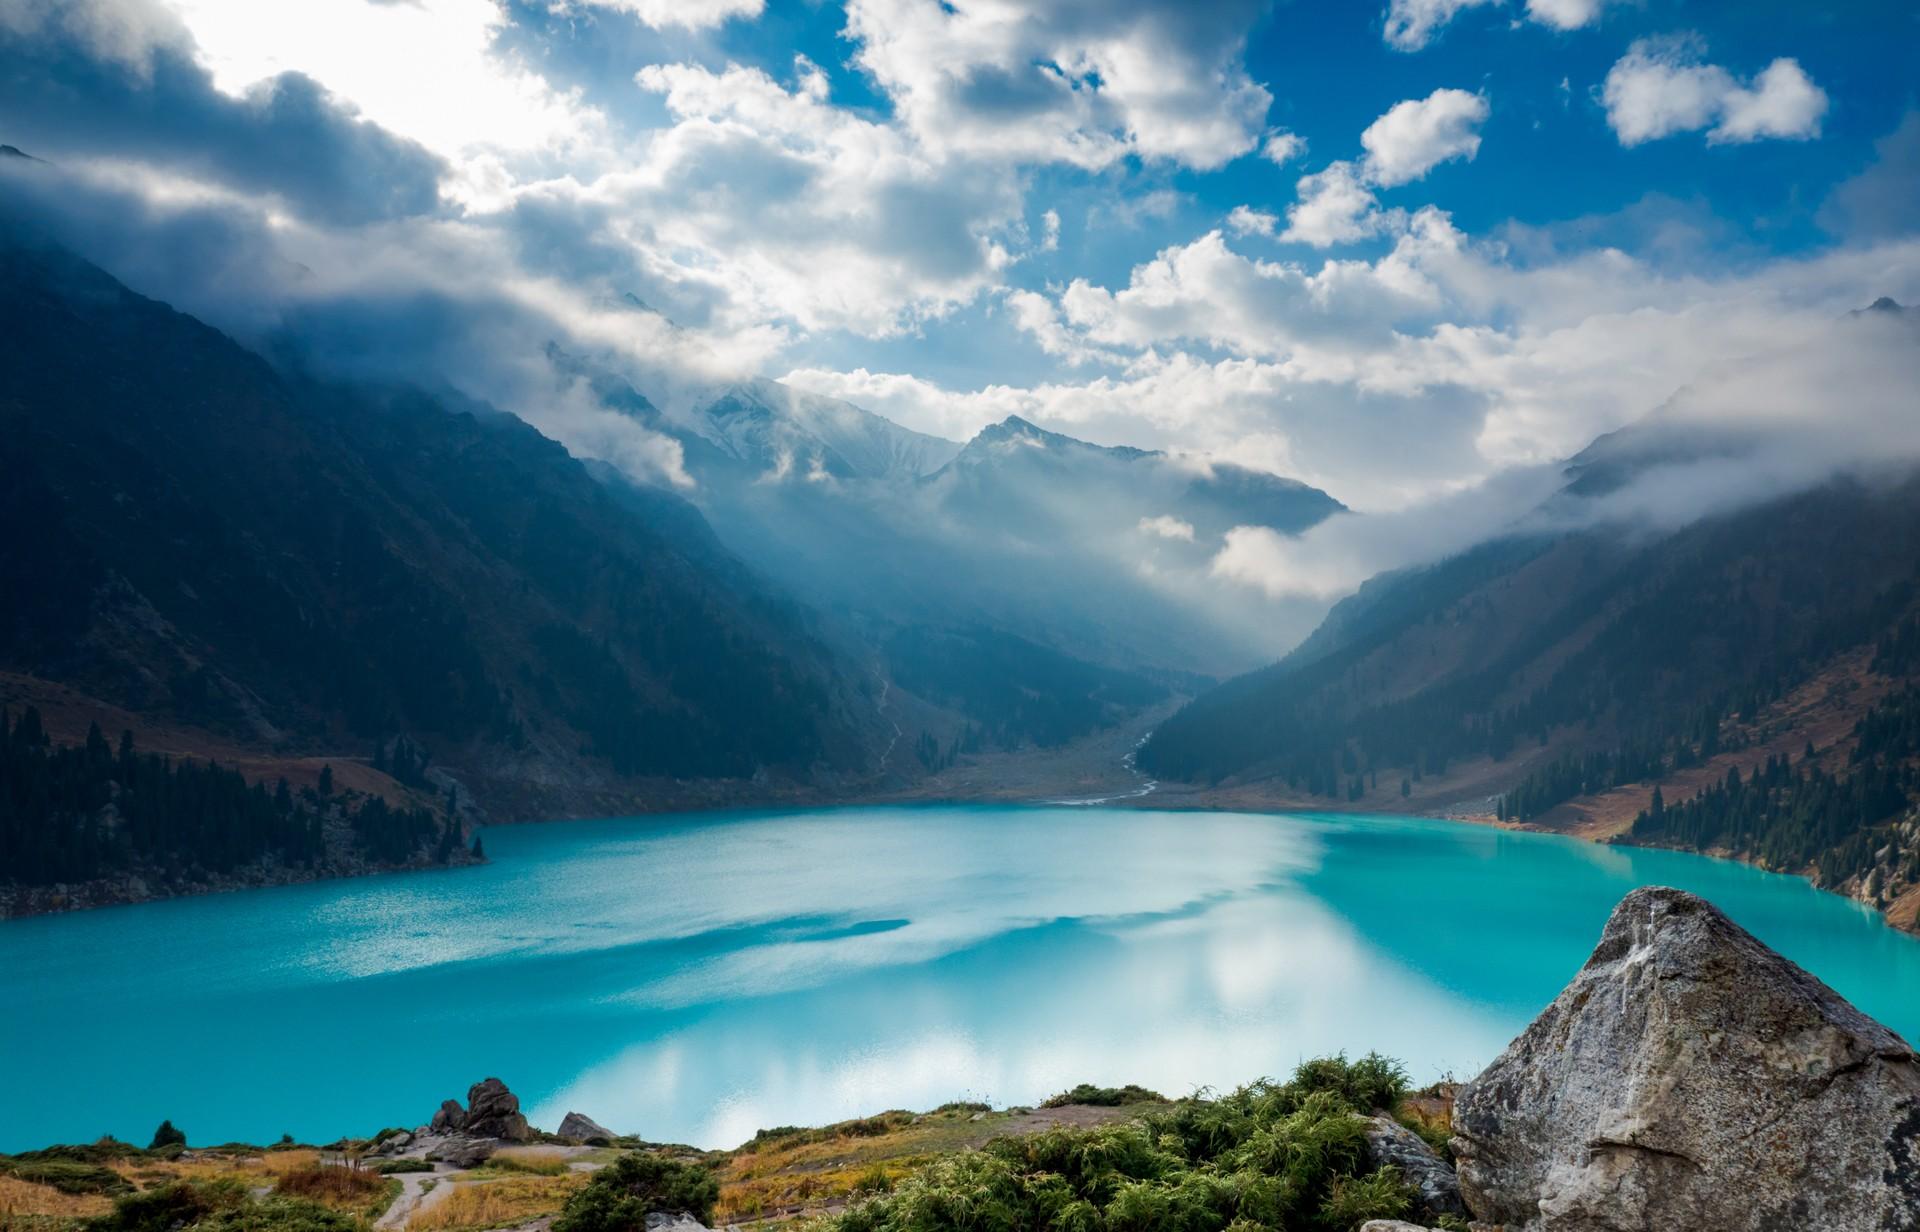 Almaty lake in Tien Shan mountains, Kazakhstan